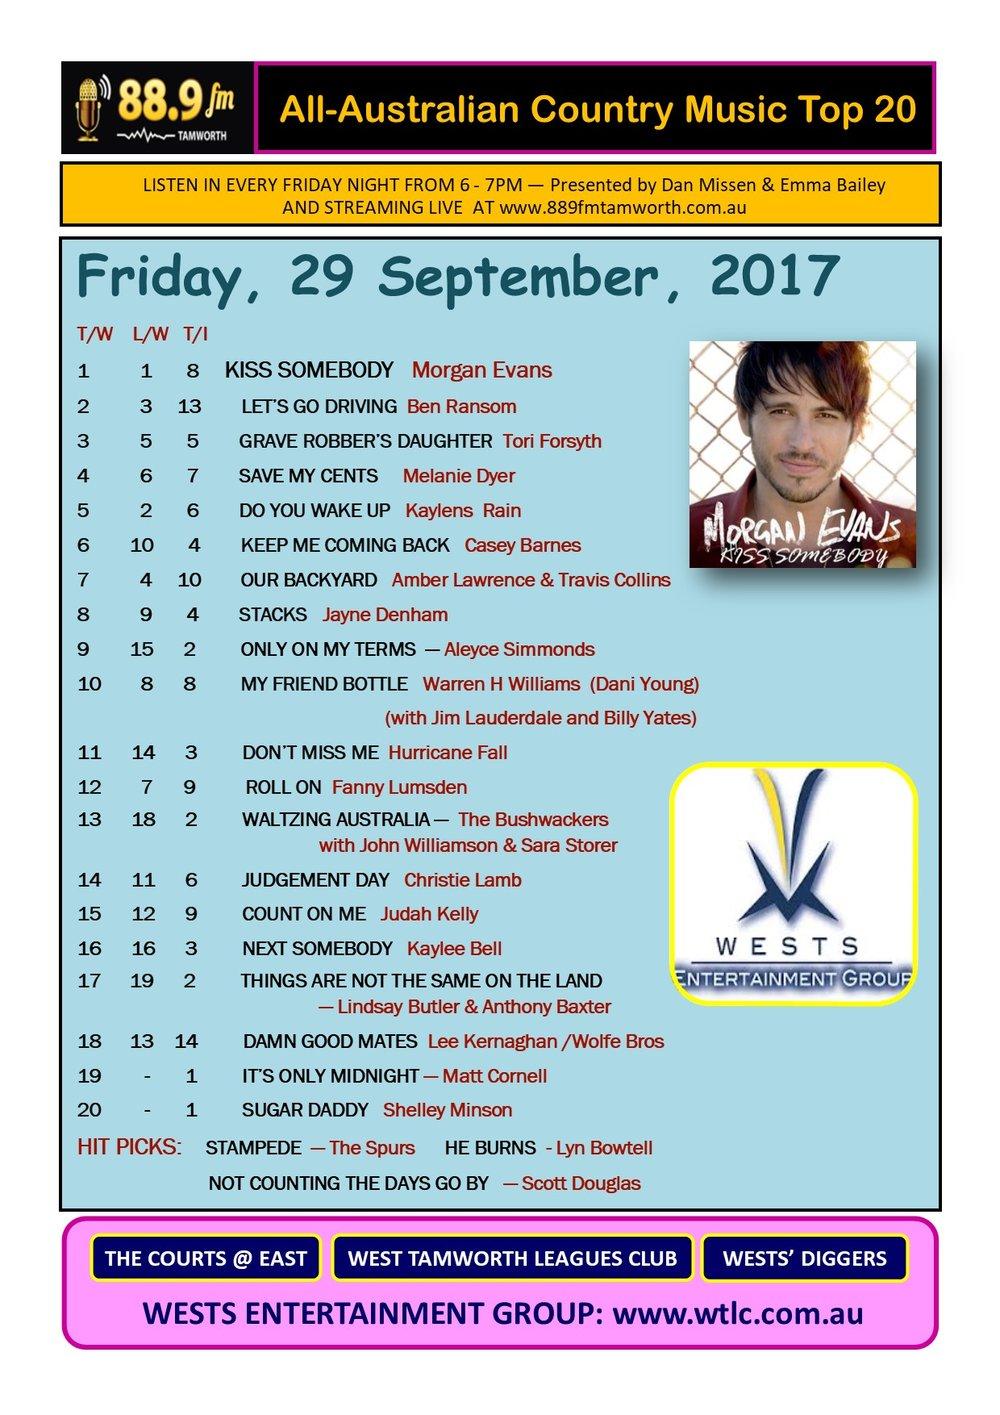 Australian Country Music Top 20 - September 29